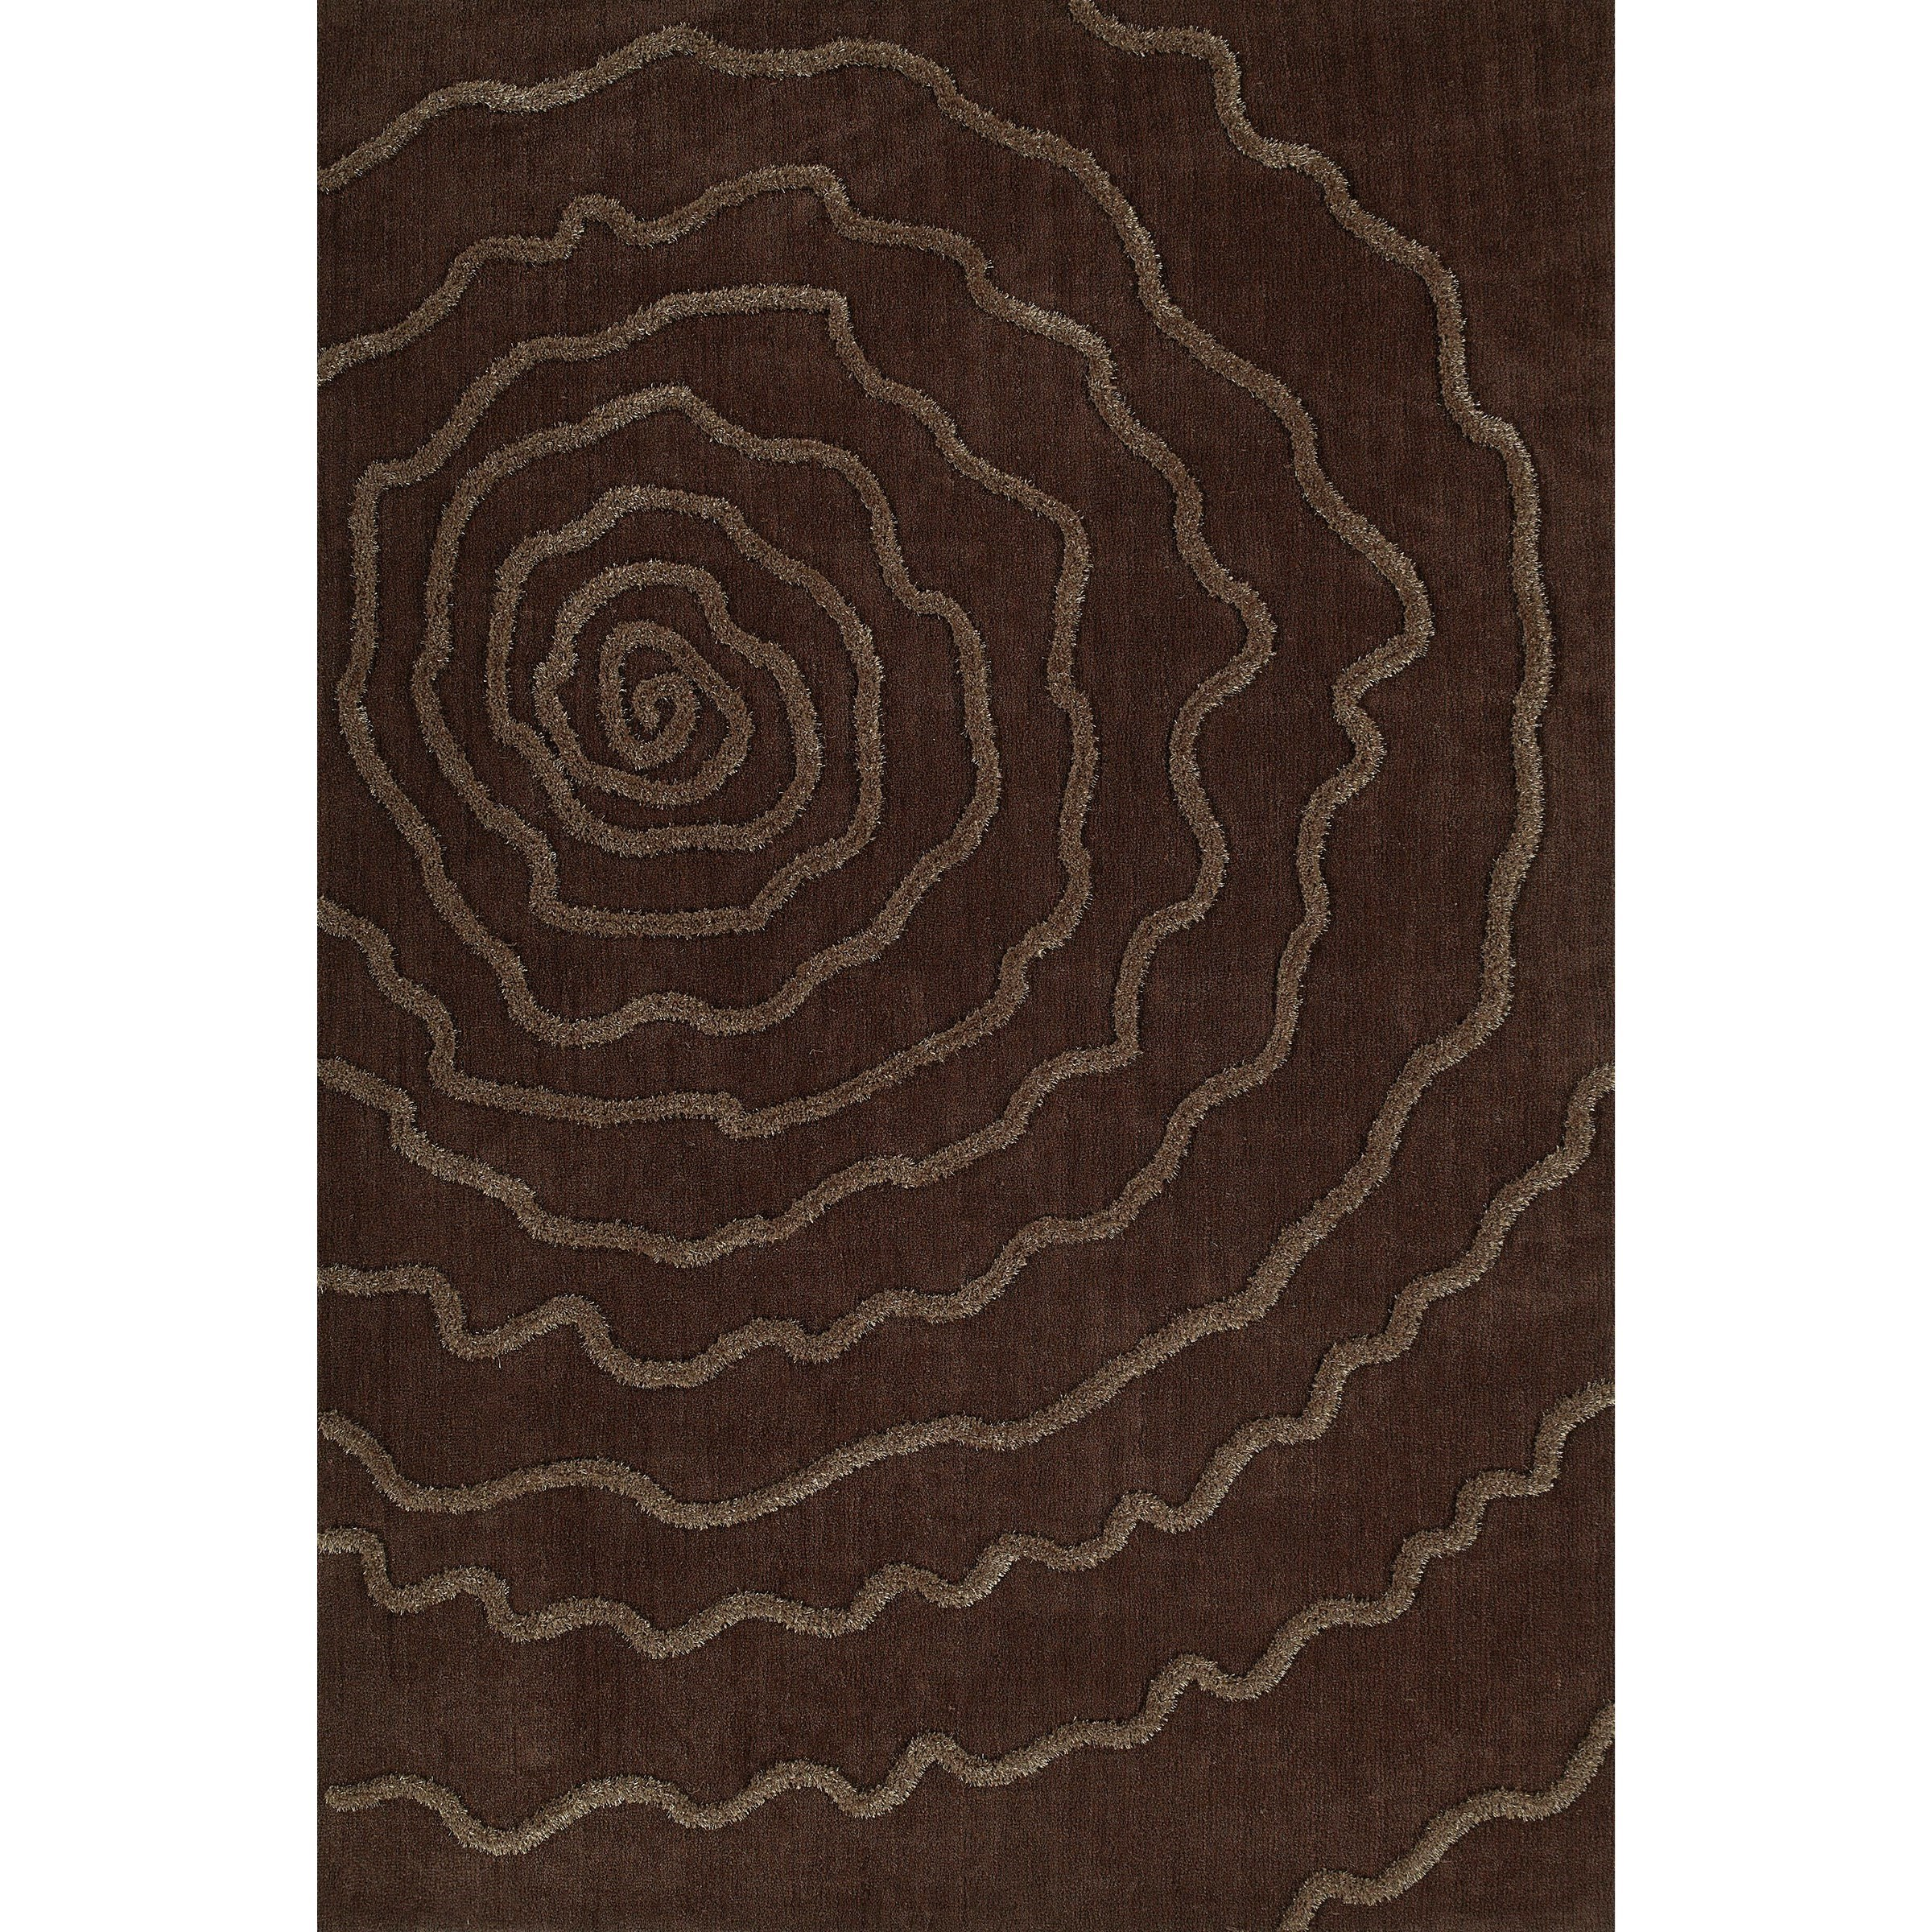 "Chocolate 5'X7'6"" Area Rug"